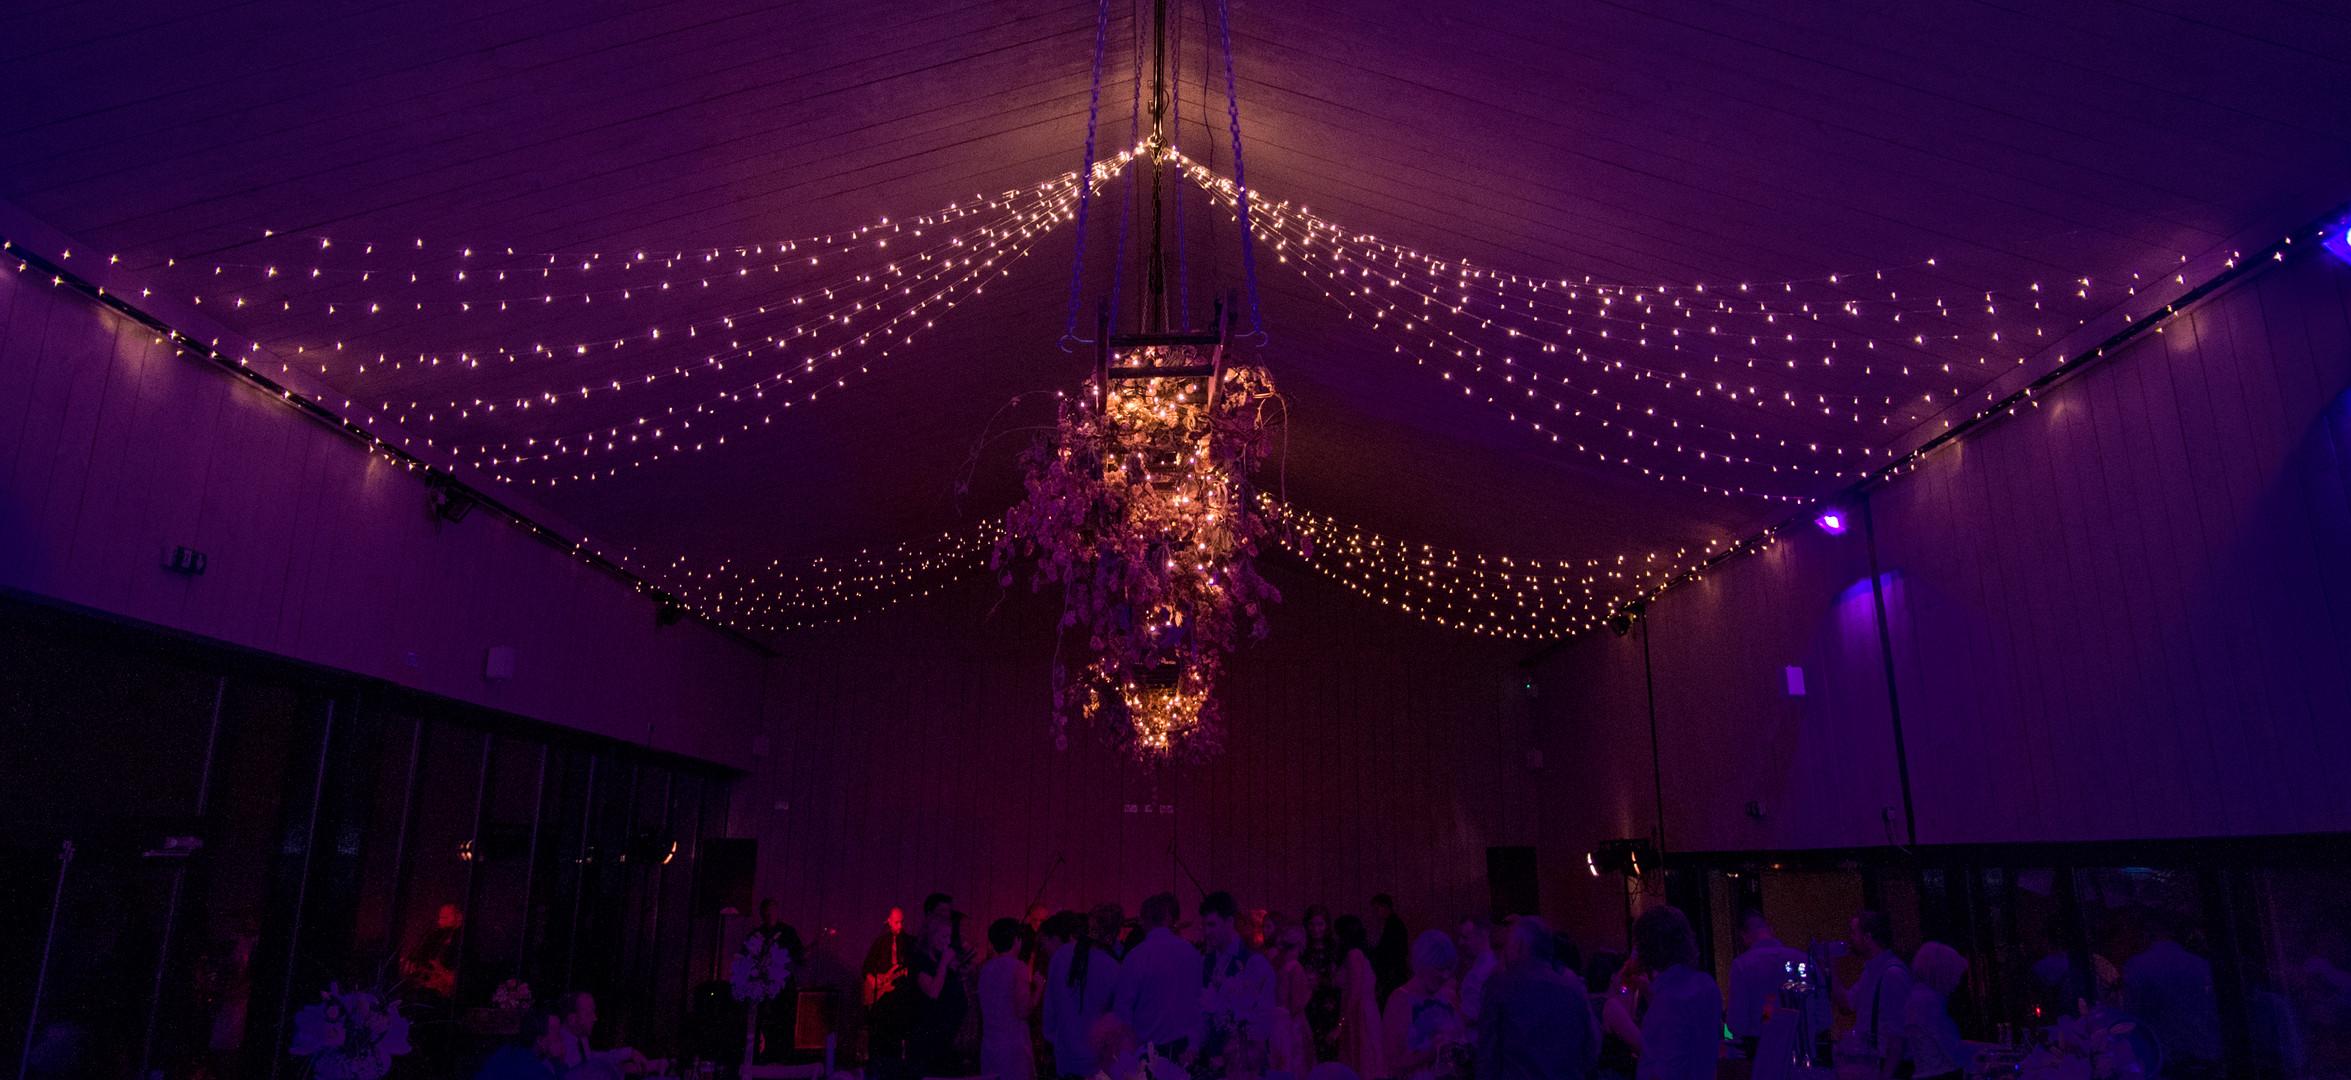 Primrose Hill Farm Wedding Venue Party Lights